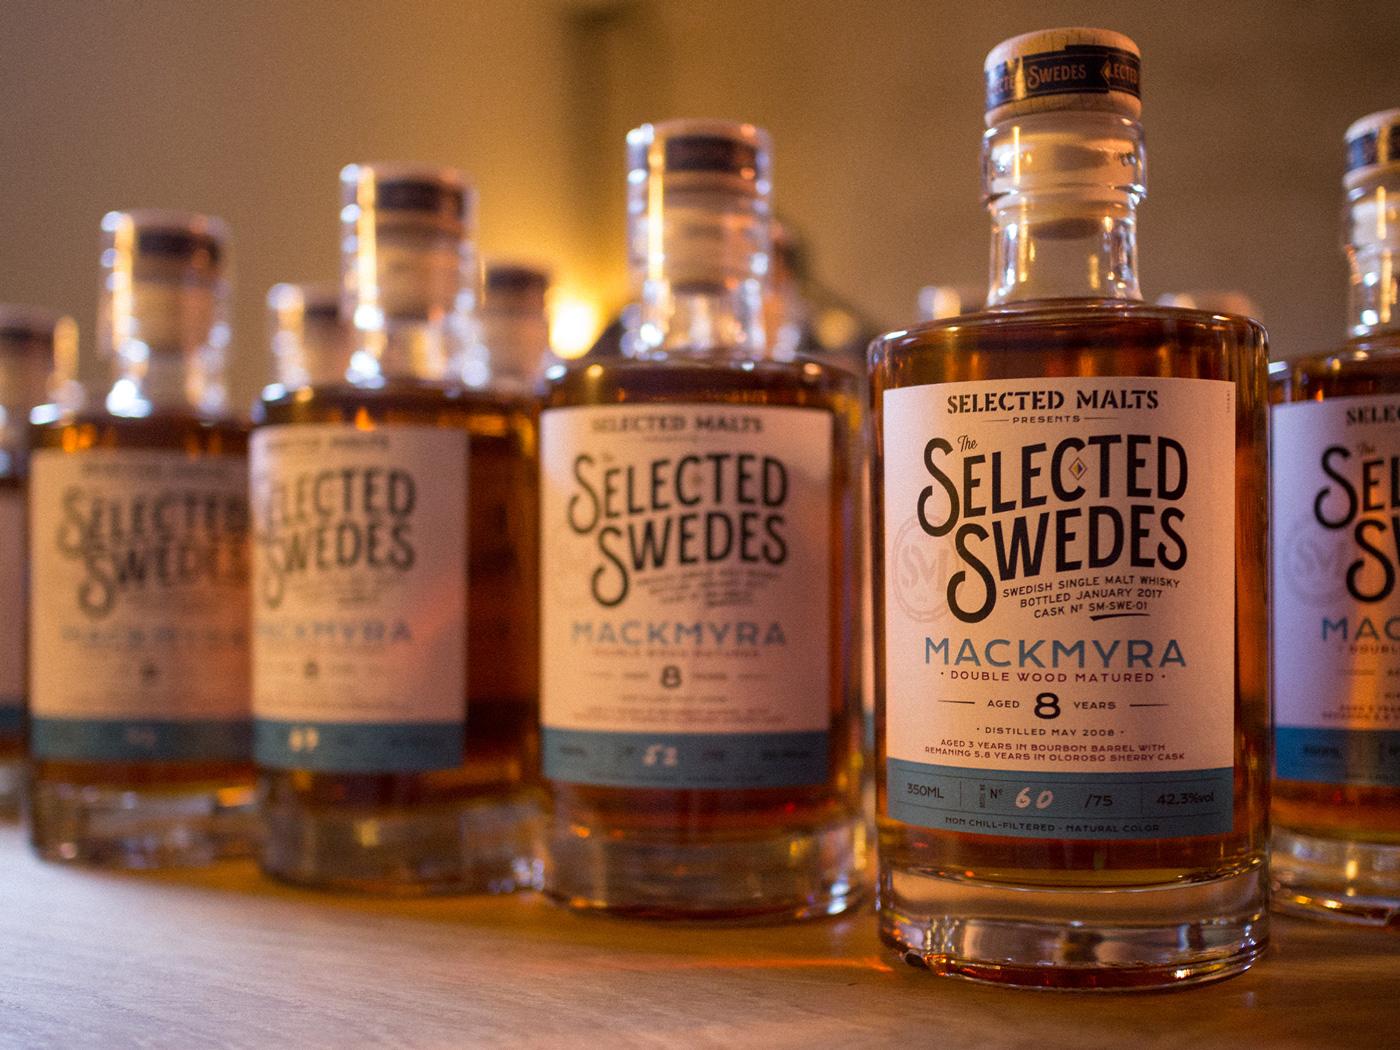 Selected Malts Selected Swedes Mackmyra Bottles Lineup